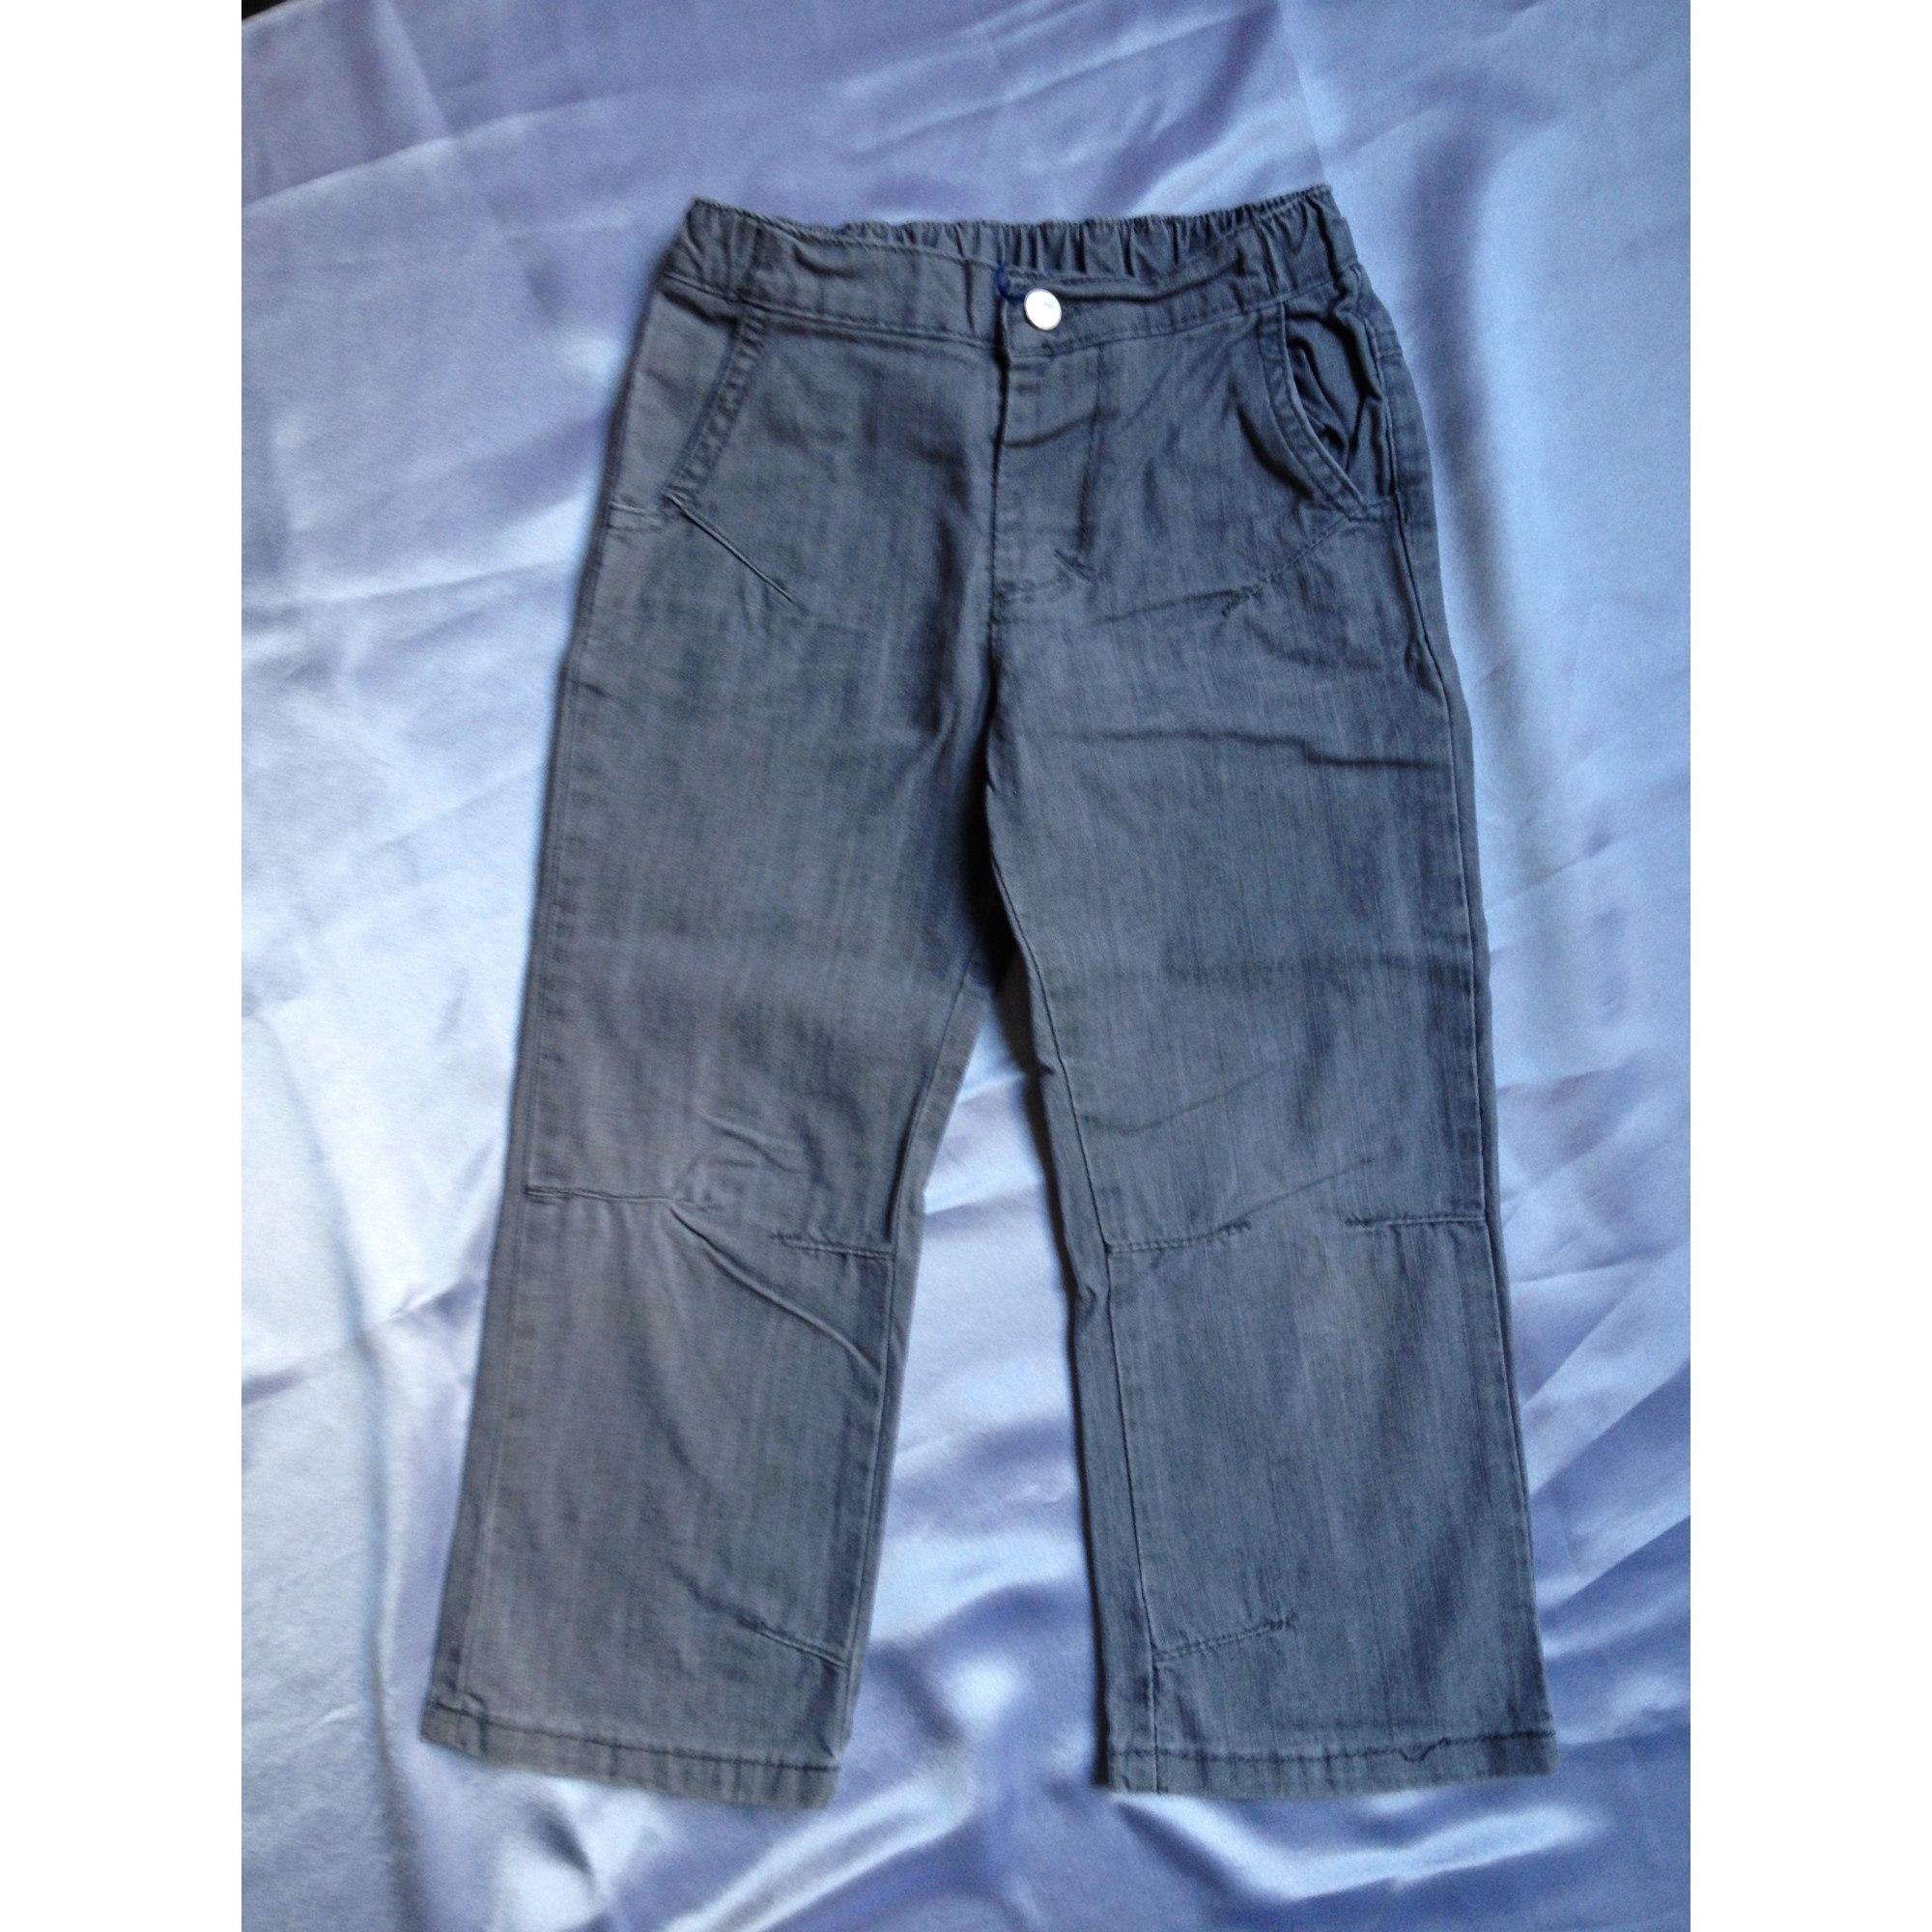 Pantalon 3 POMMES Gris, anthracite